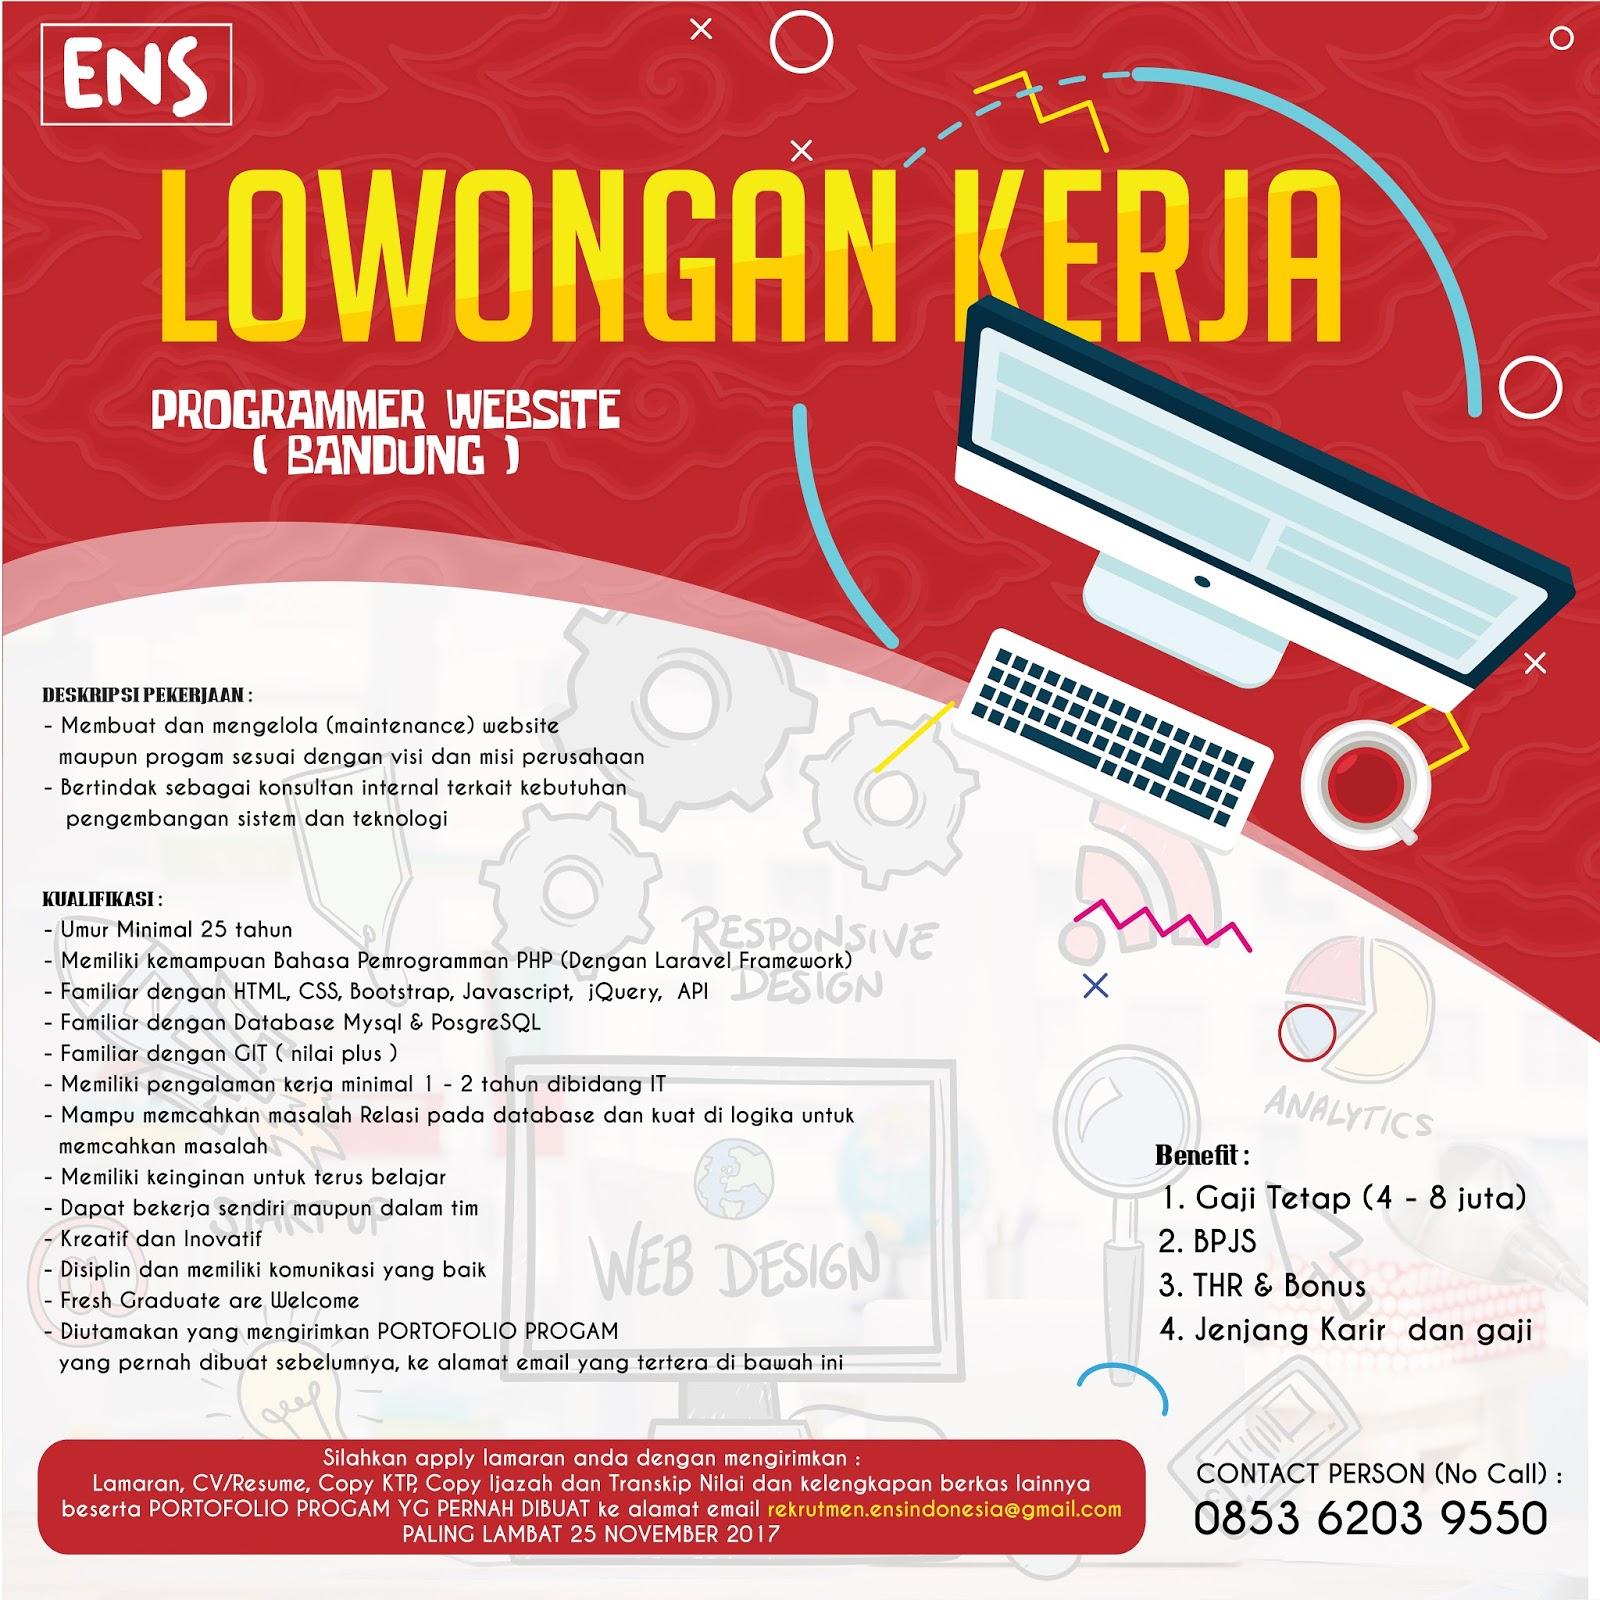 Lowongan Kerja Programmer Website ( Bandung ) ENS Indonesia November 2017